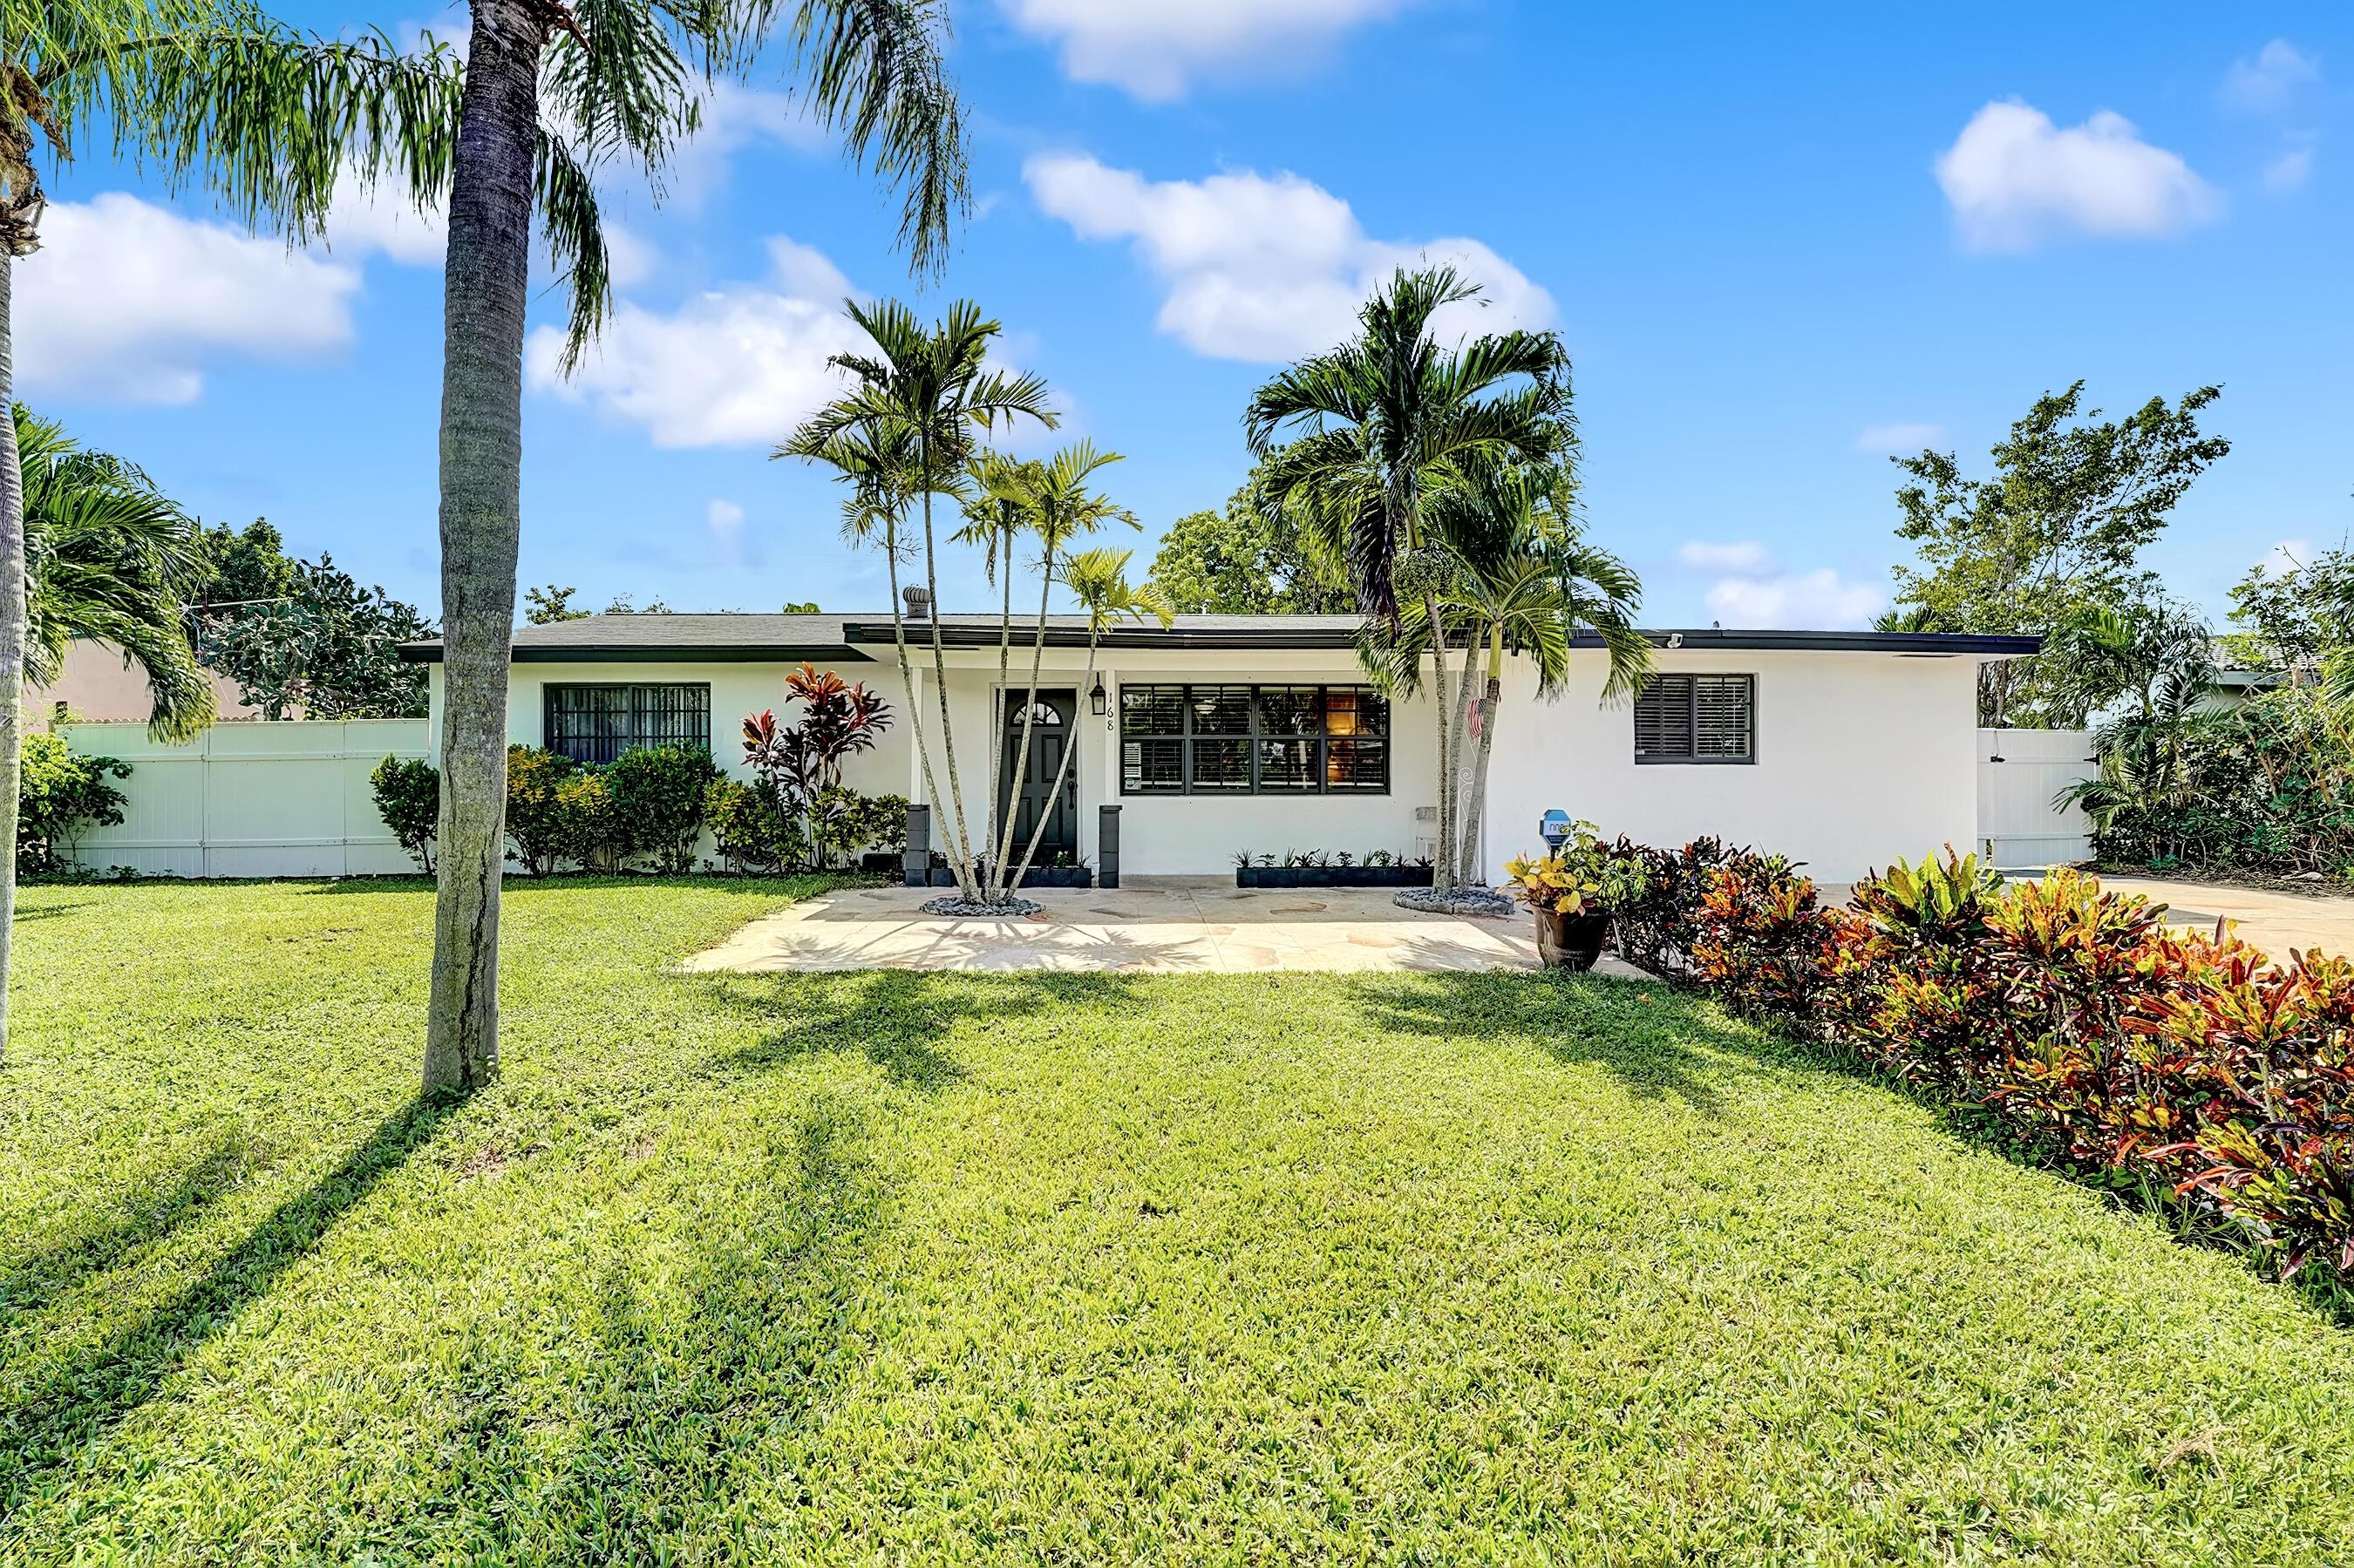 168 SE 31st Avenue Boynton Beach, FL 33435